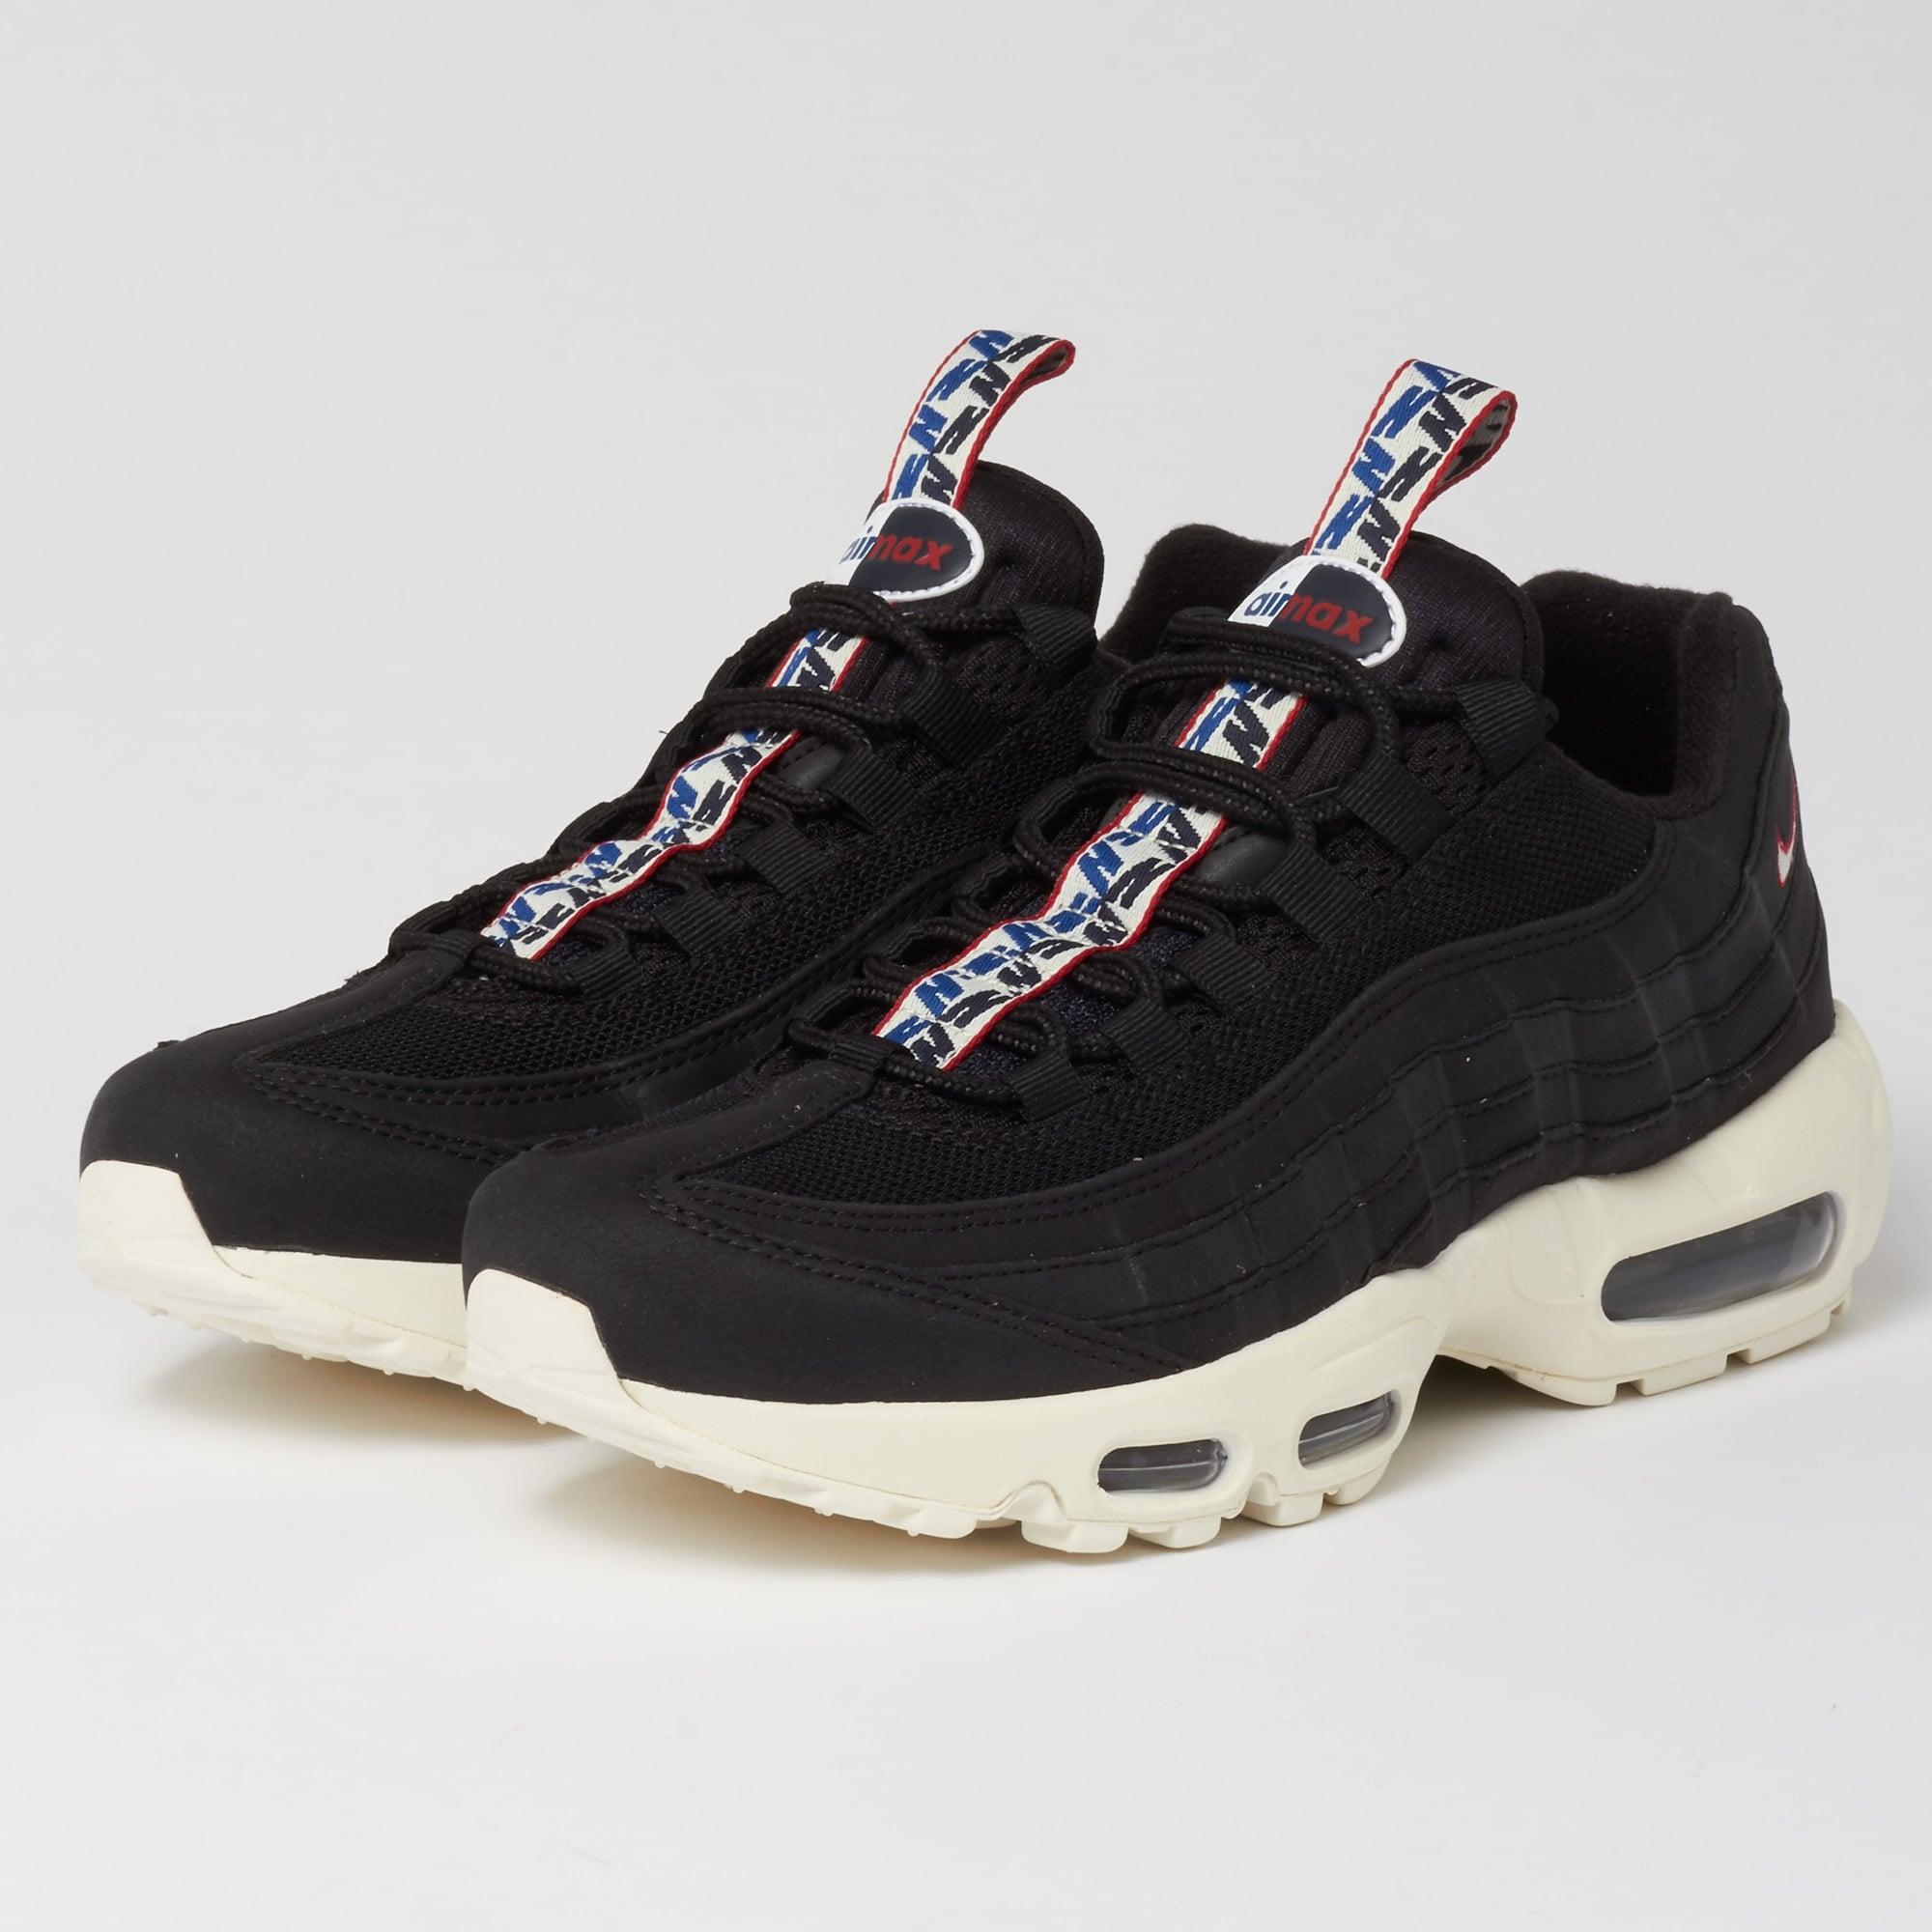 mens nike air max 95 london running shoes nz